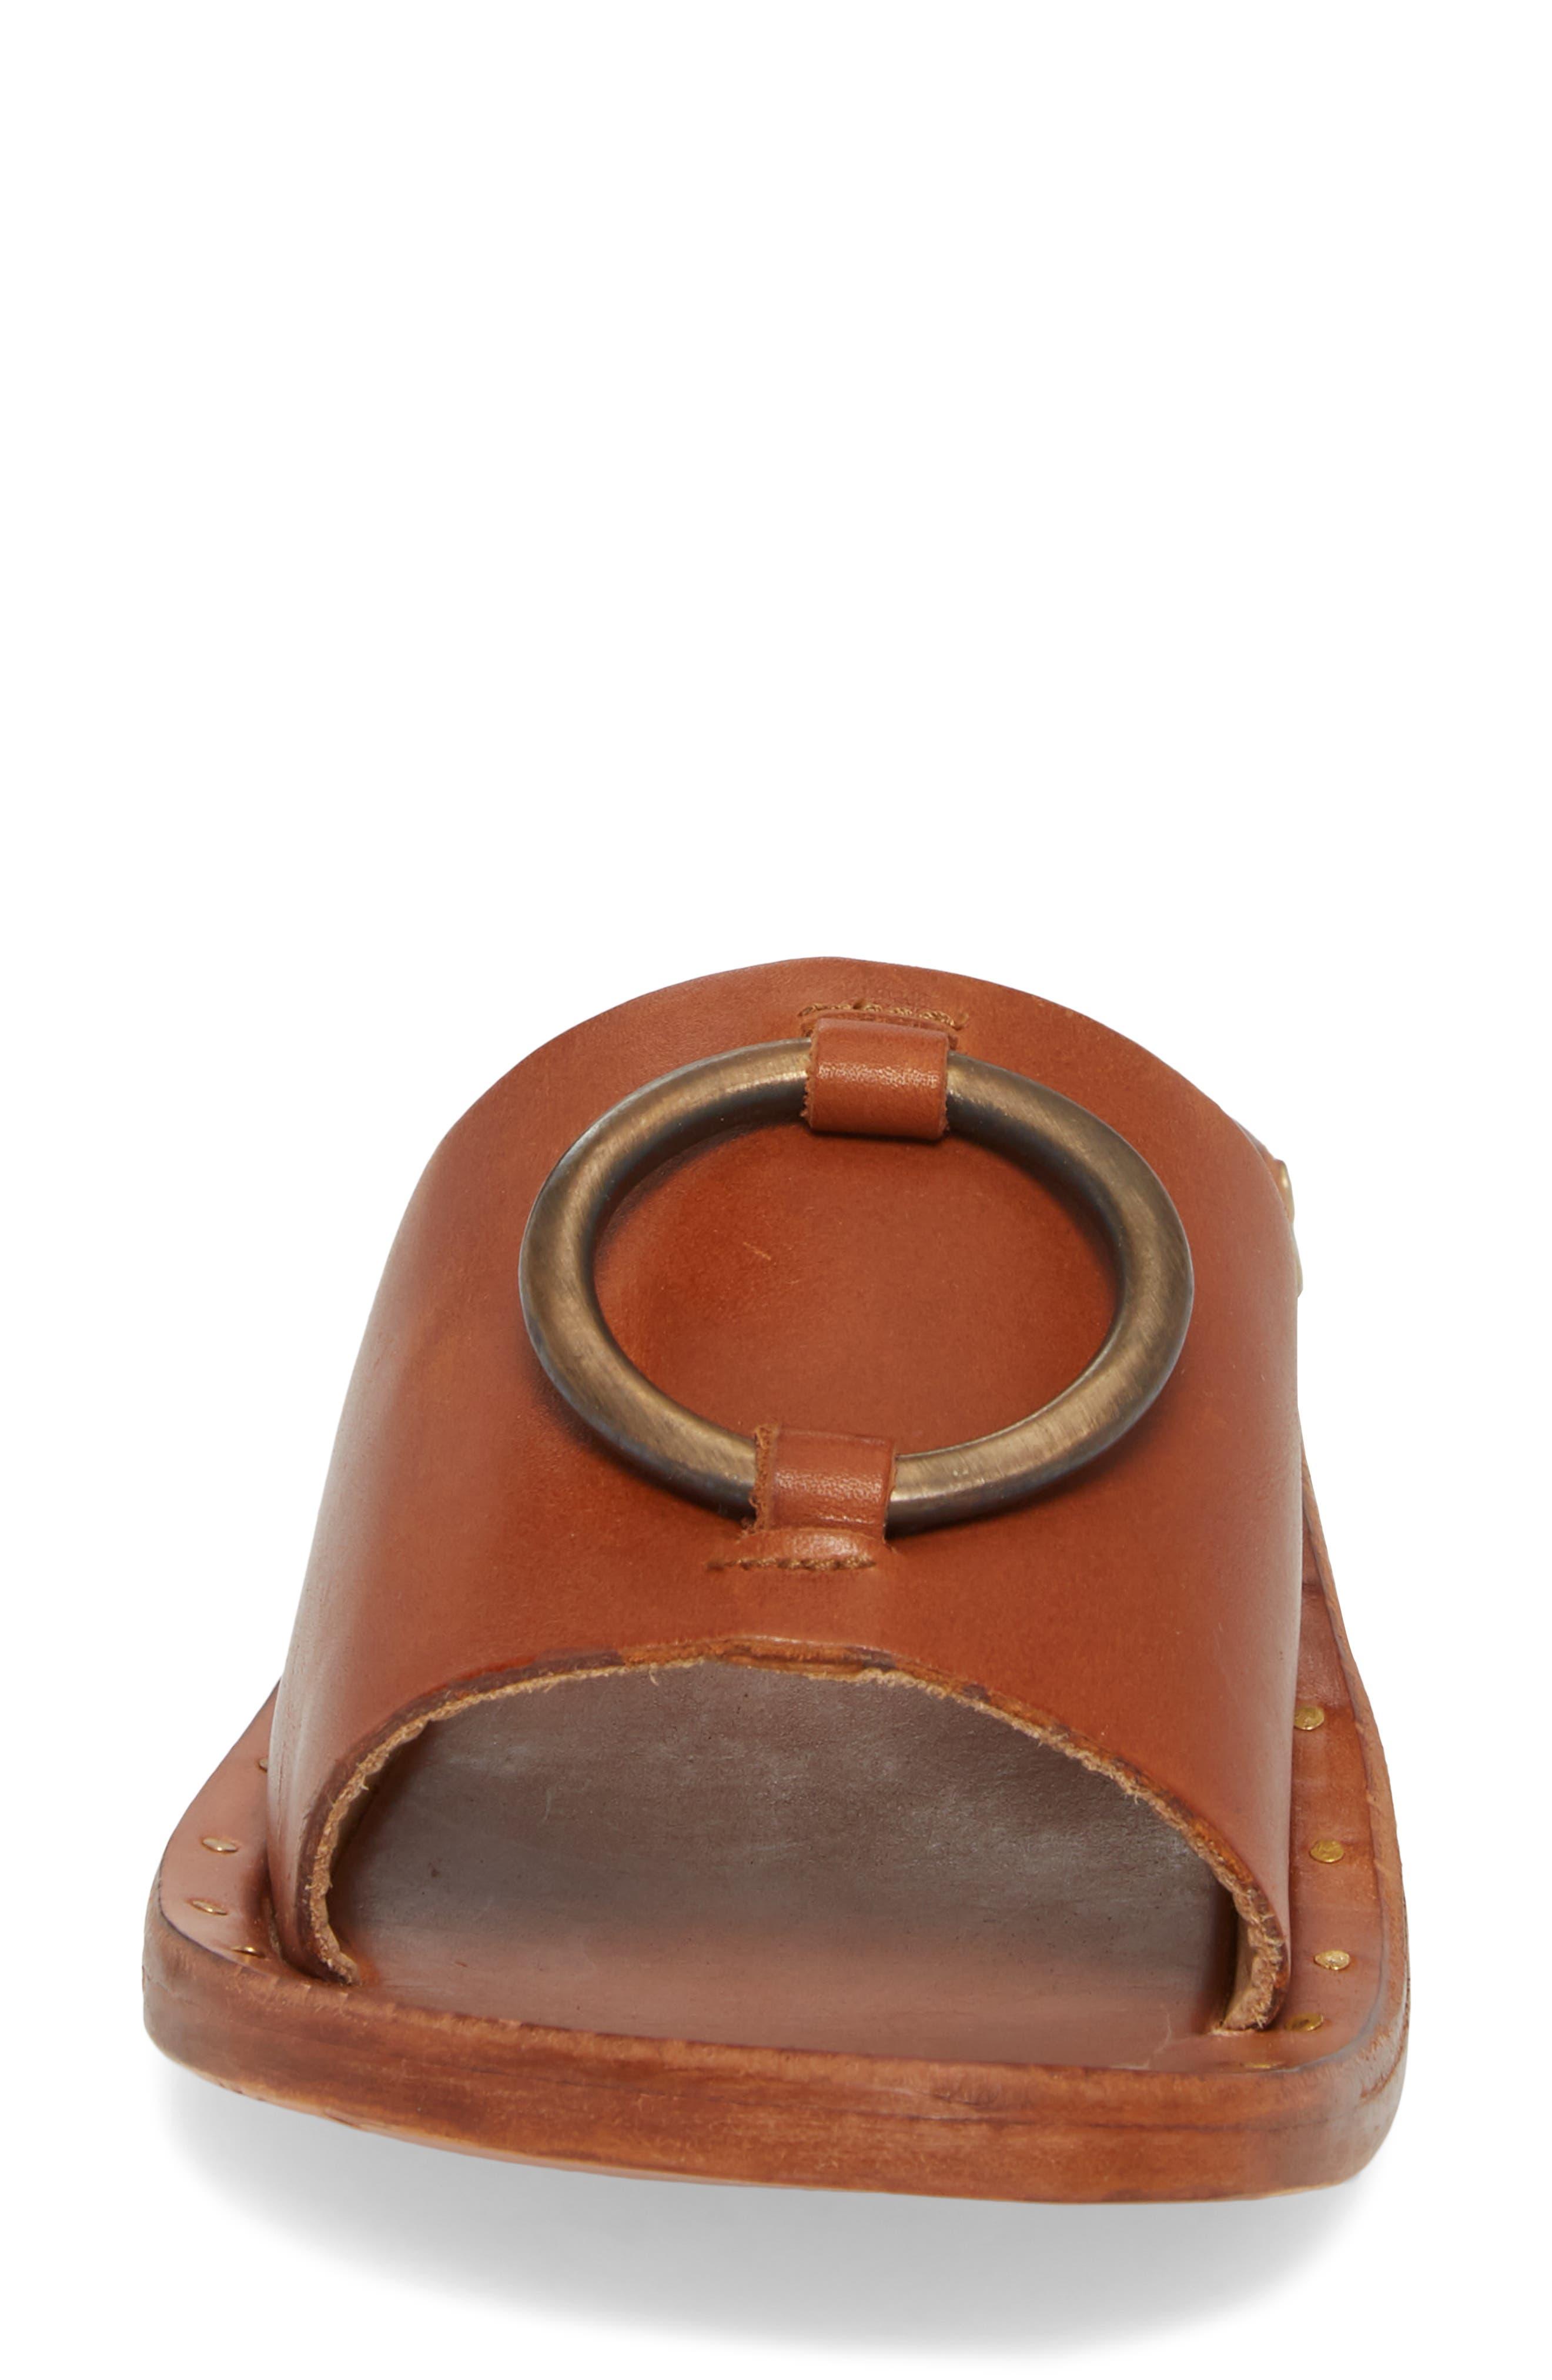 Cockatoo Slide Sandal,                             Alternate thumbnail 4, color,